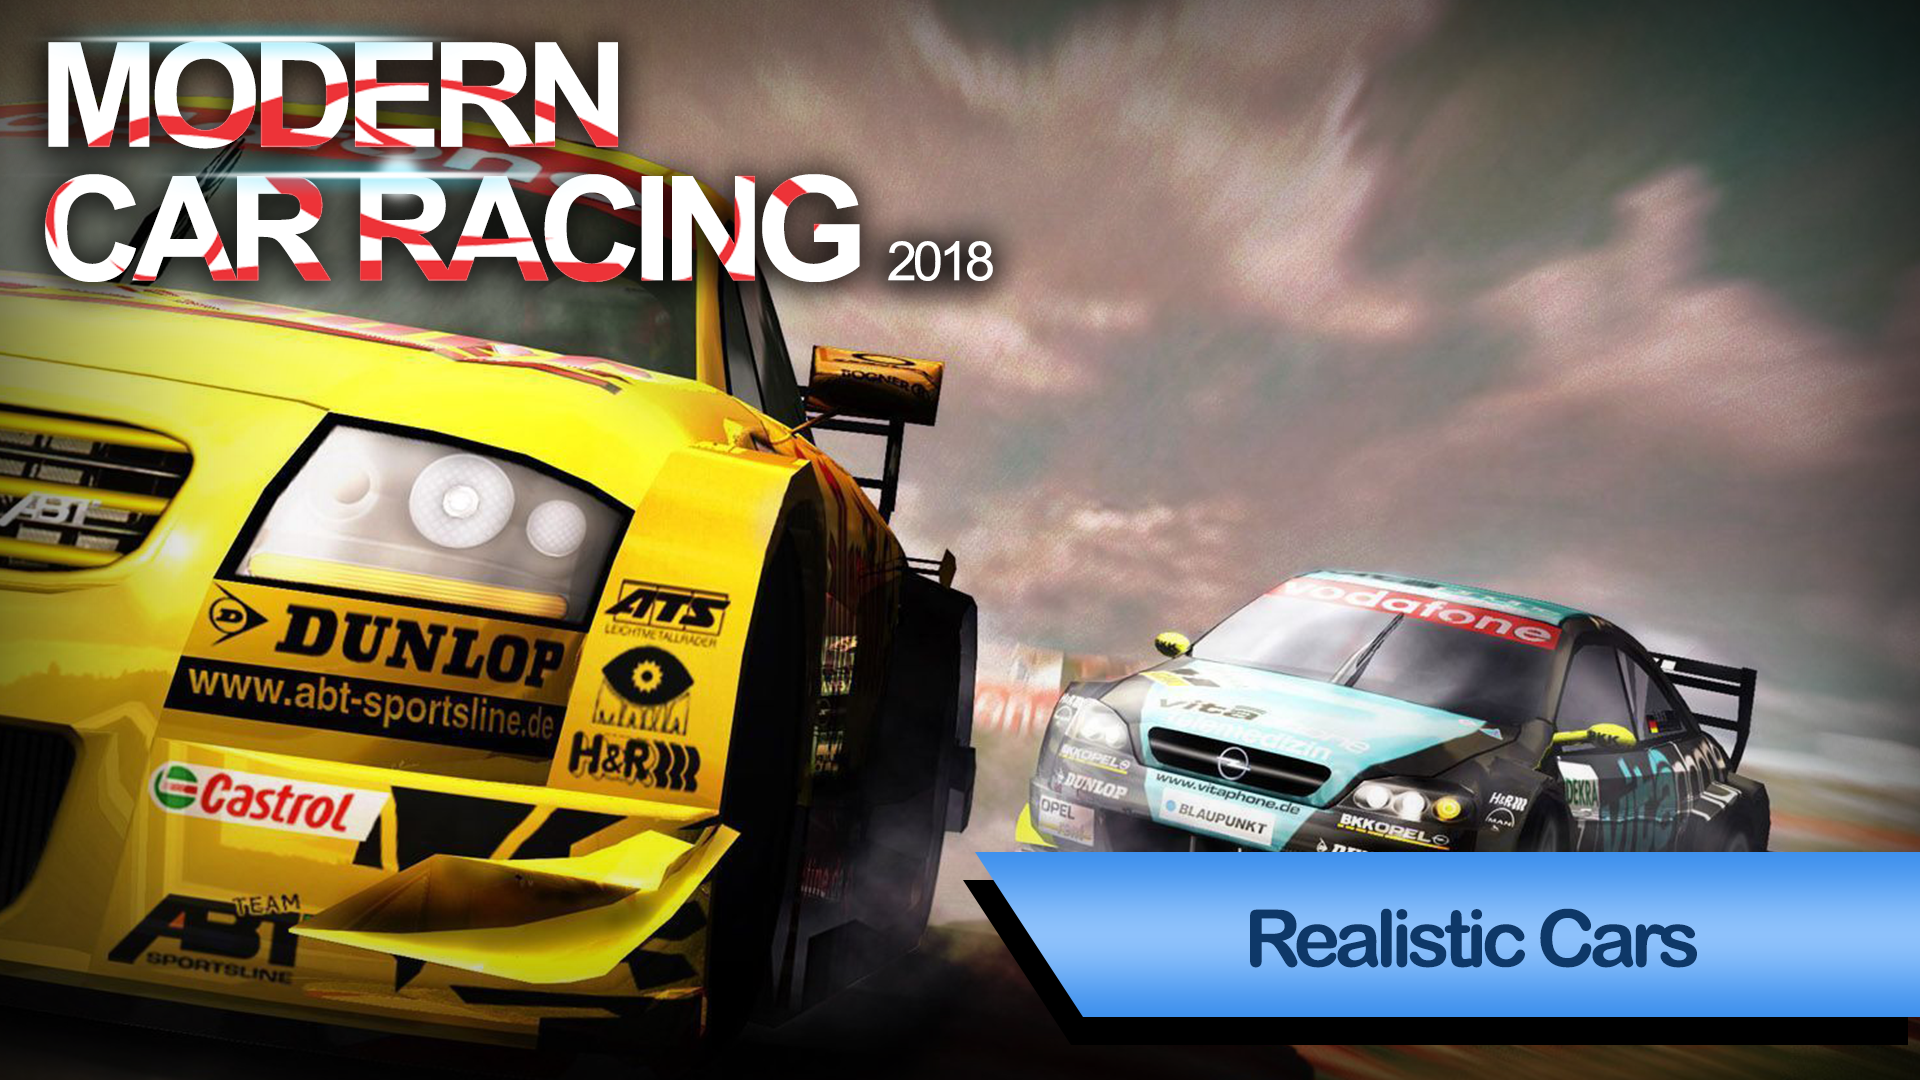 Modern Car Racing 2018